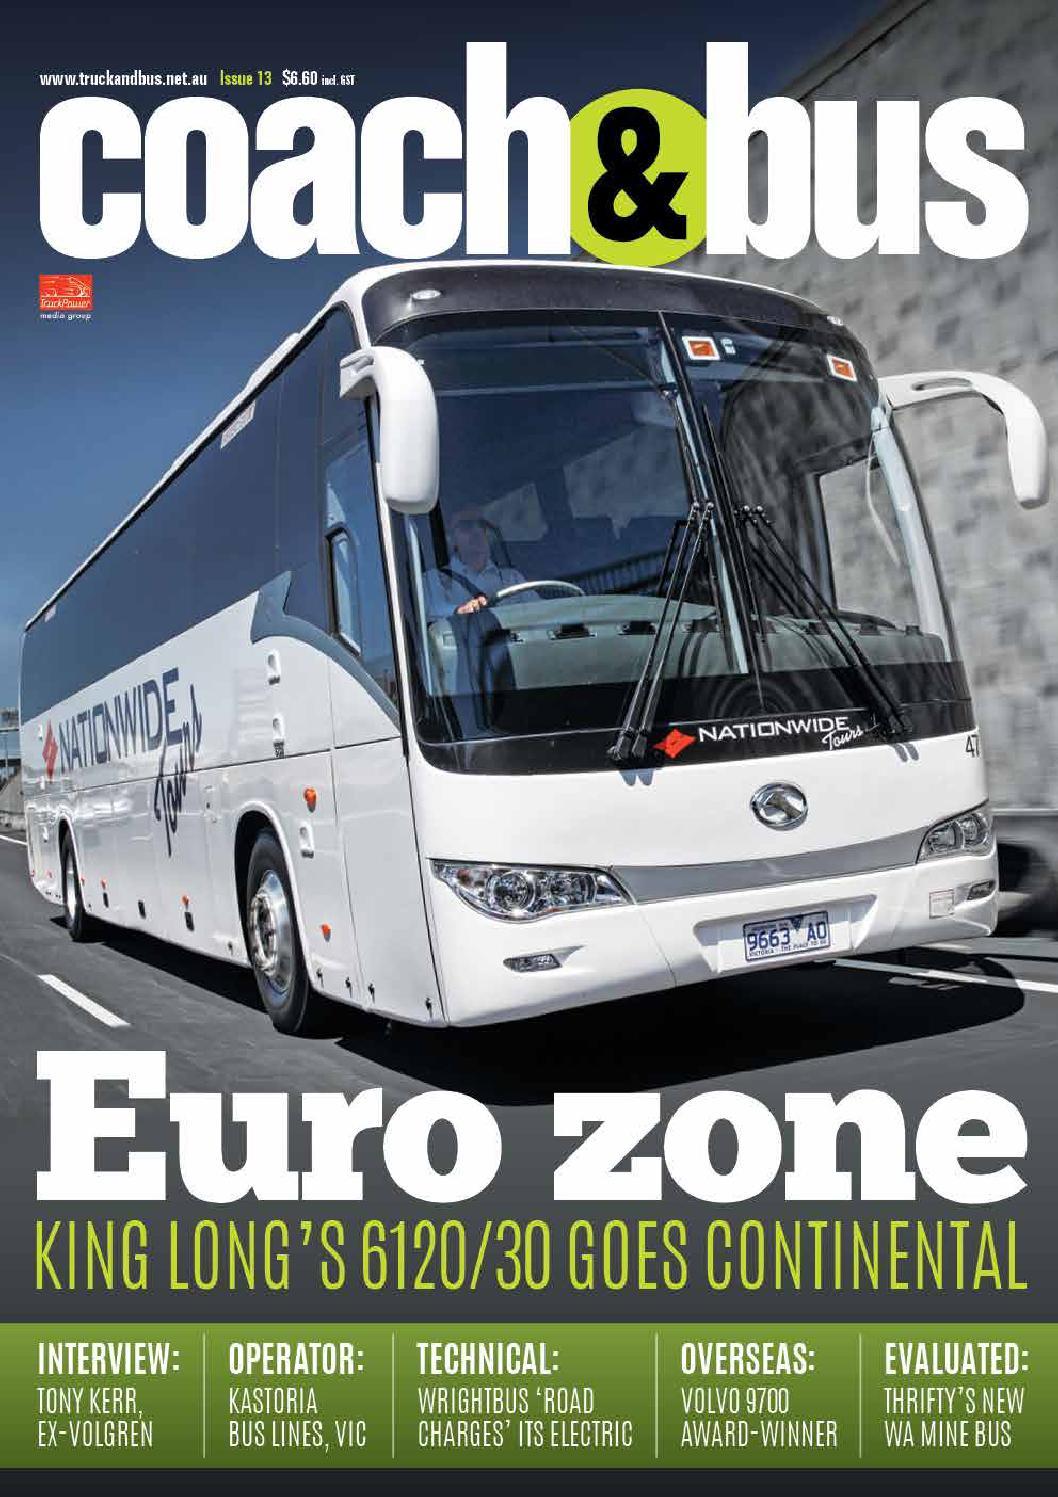 Coach bus today issue 13 by transport publishing australia issuu falaconquin